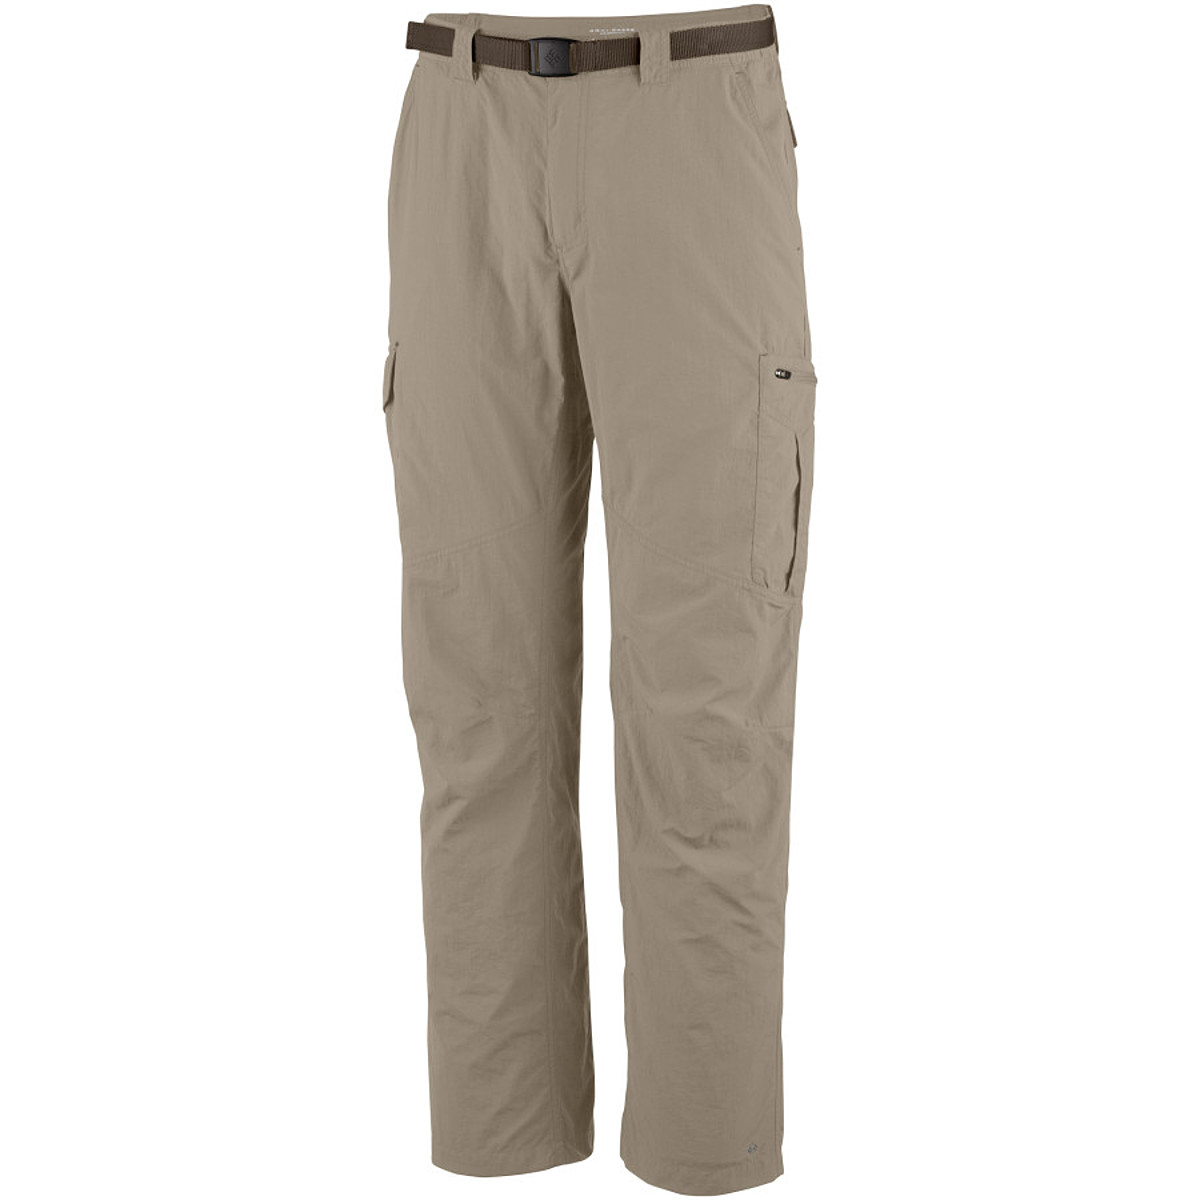 7aa361046 Columbia Silver Ridge Cargo Pant Reviews - Trailspace